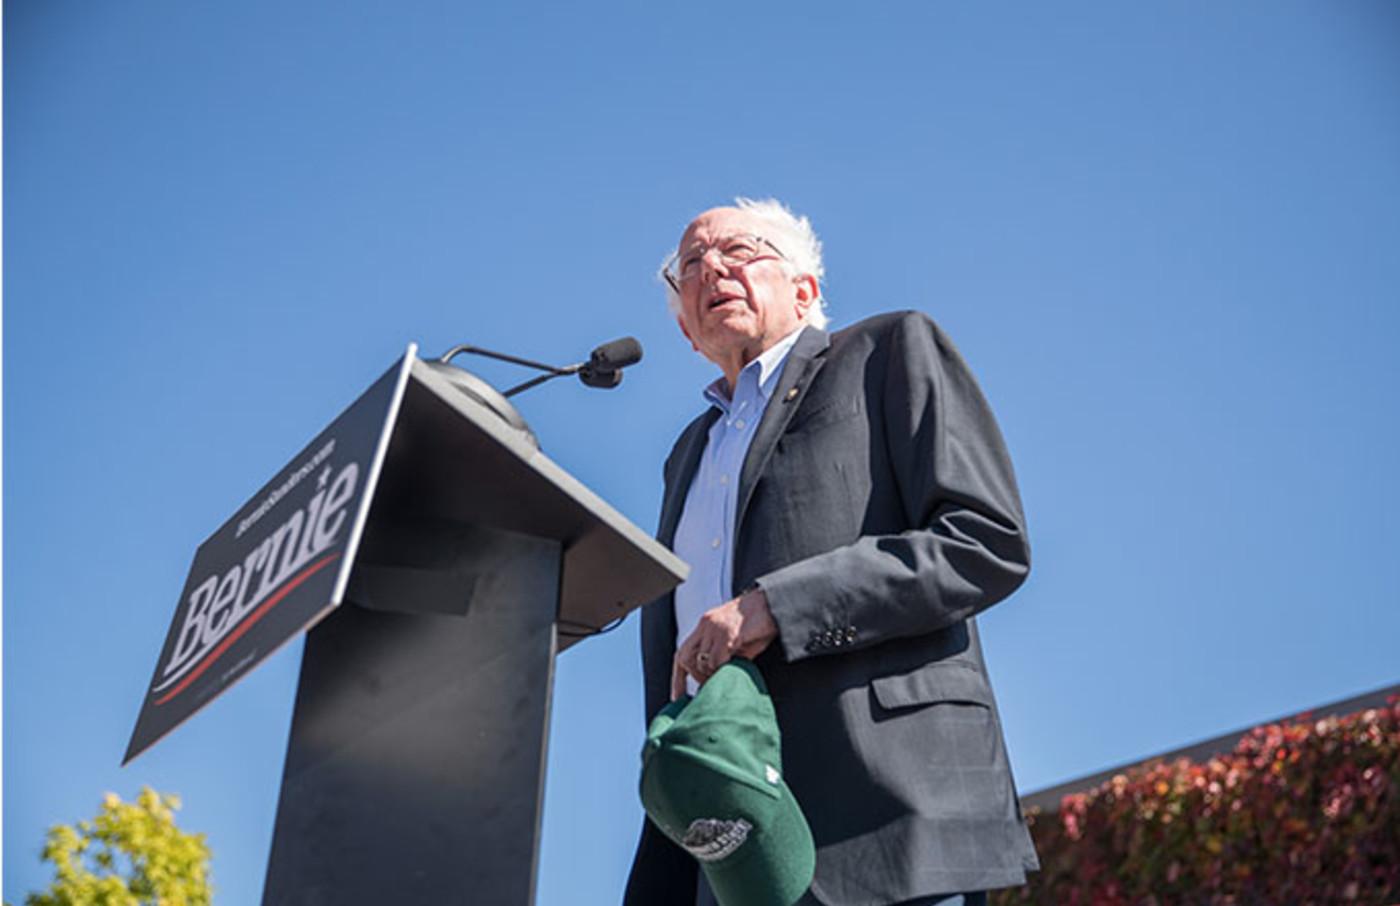 This is a photo of Bernie Sanders.